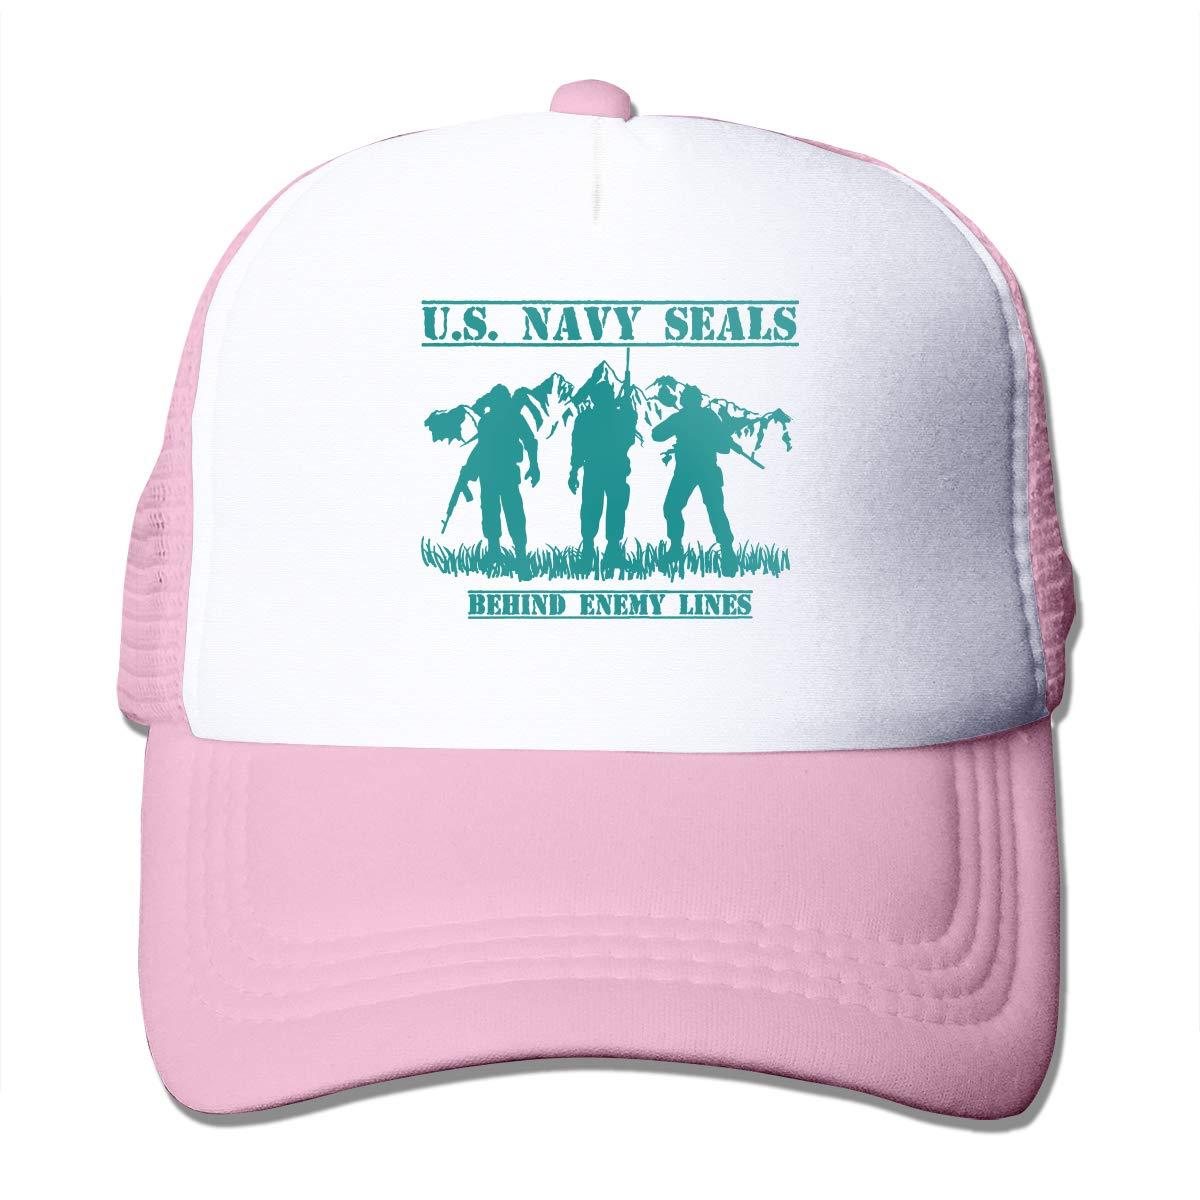 US Navy Seals Behind Enemy Lines Adult Mens Sling All-Star Adjustable Hat Sun Hat